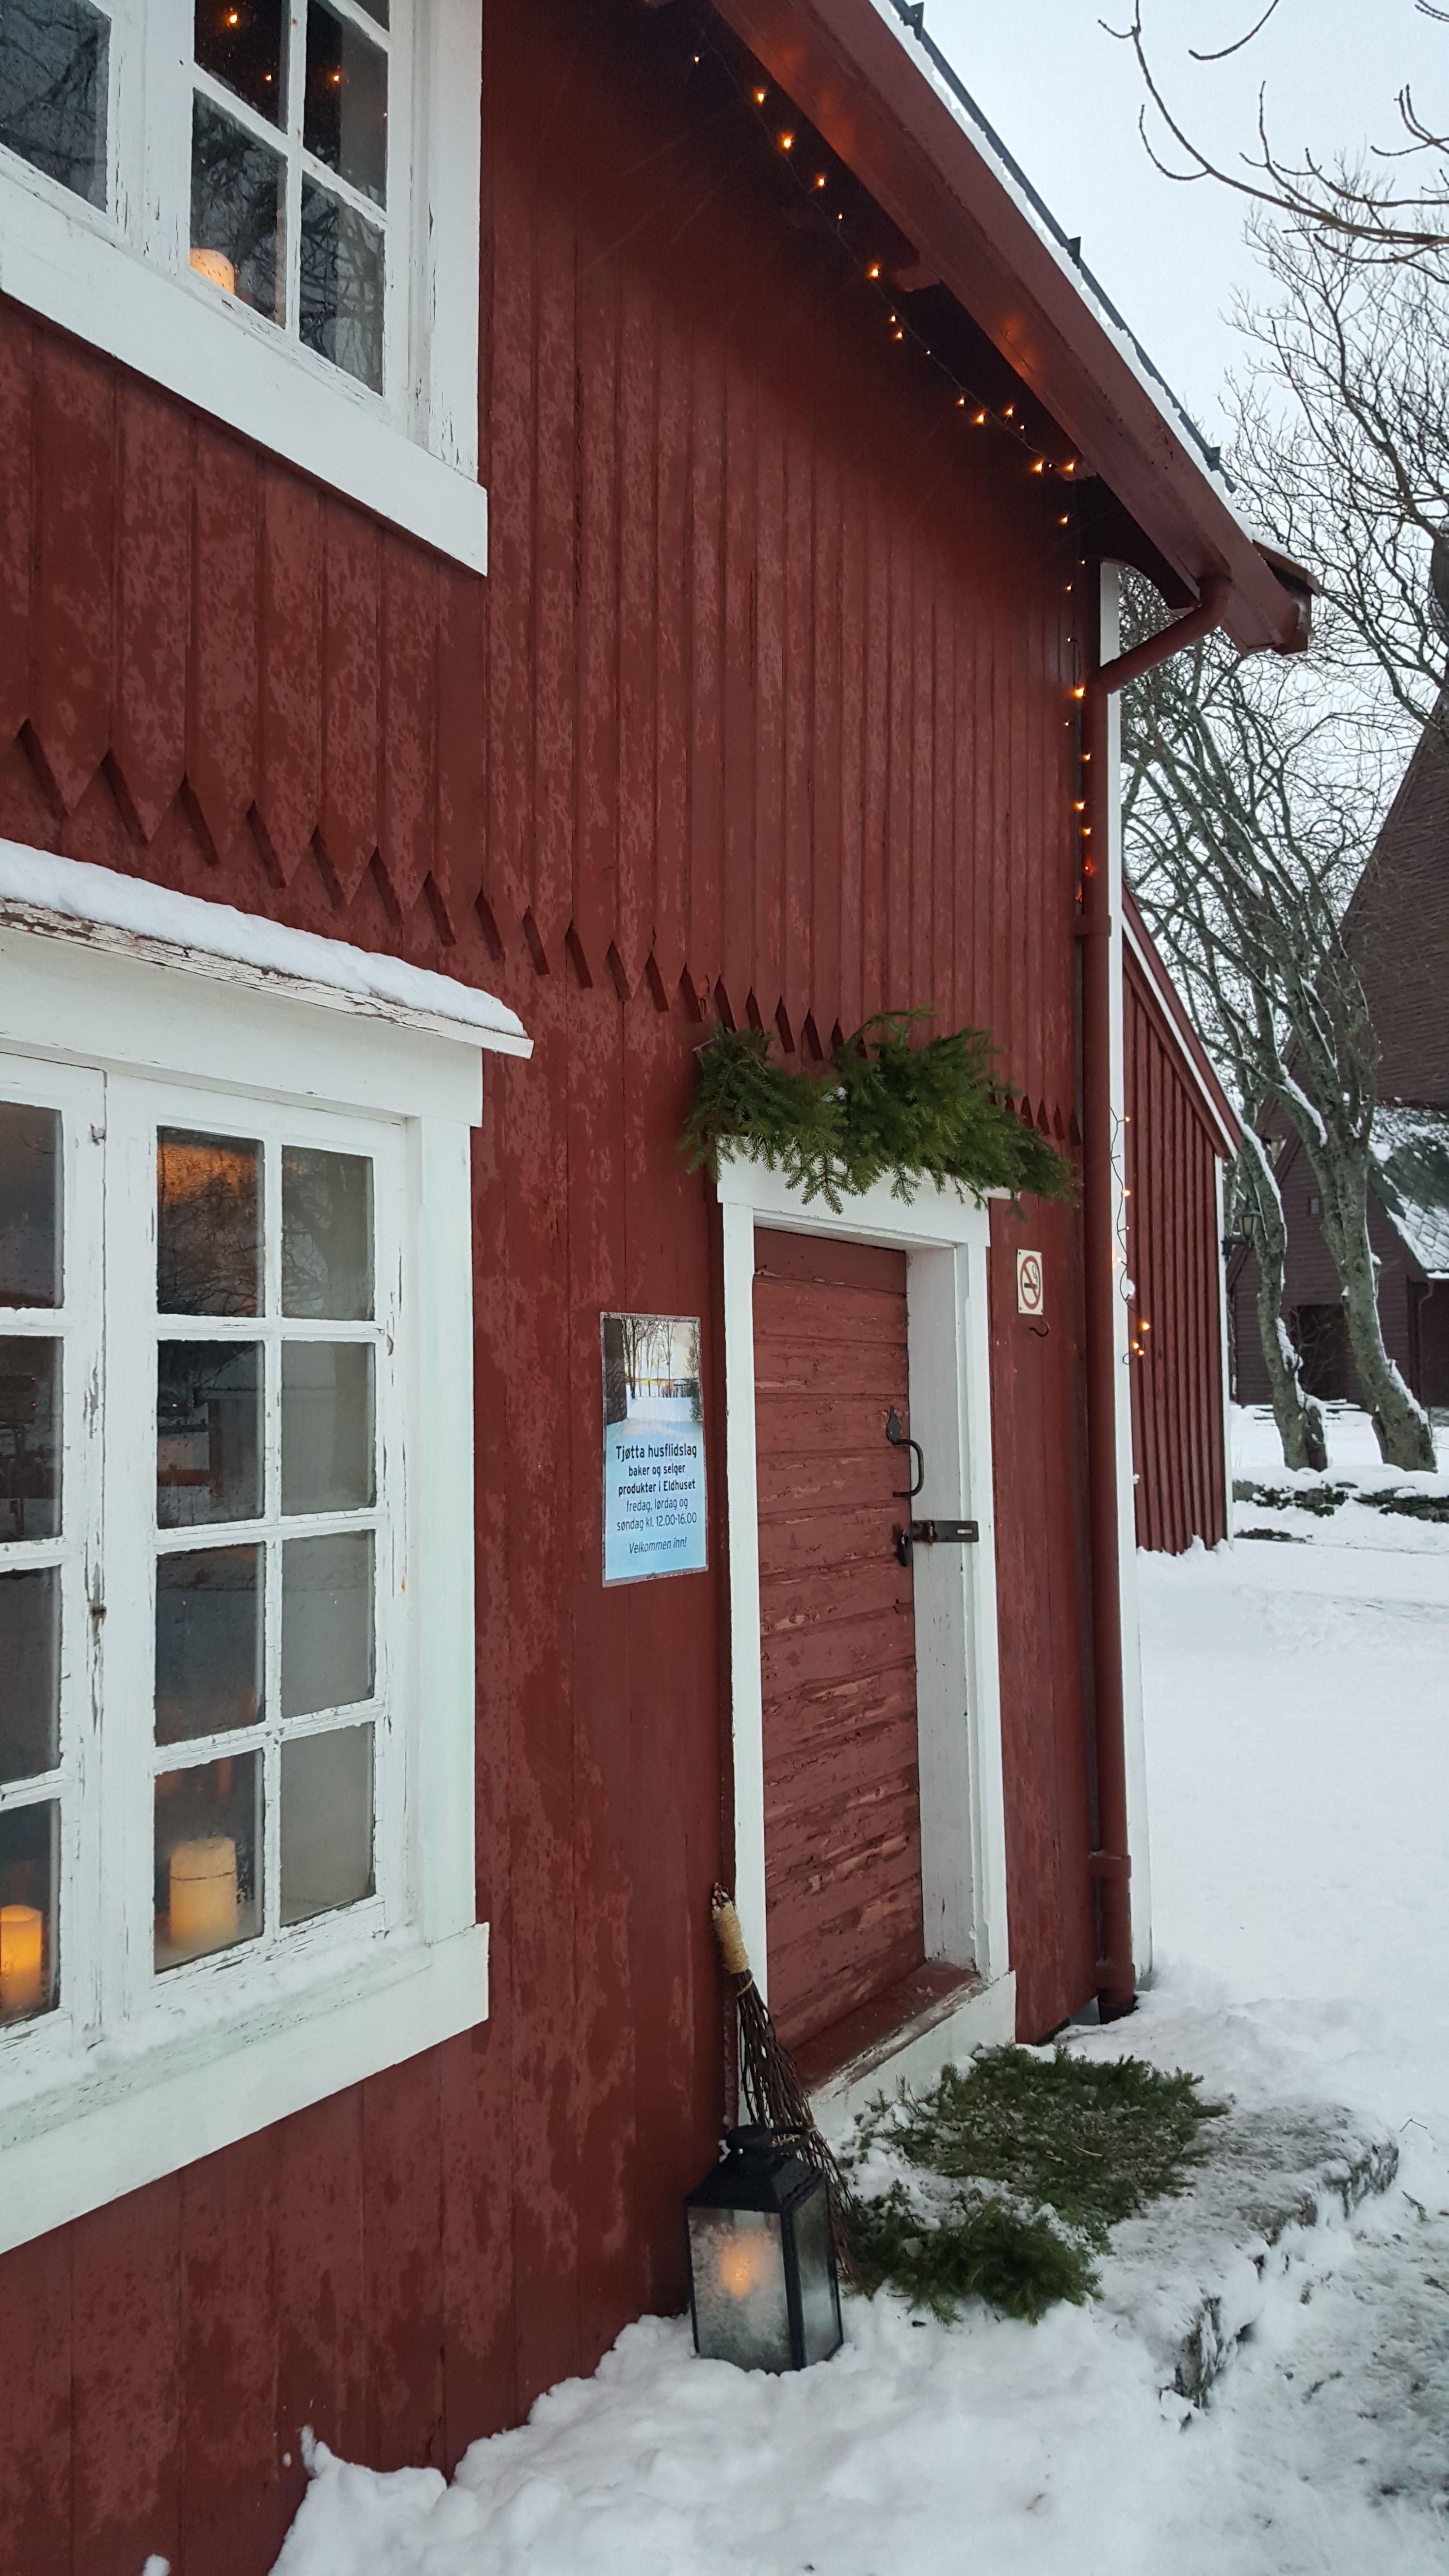 Petter Dass-museet , Eldhuset på Alstahaugtunet en vinterdag